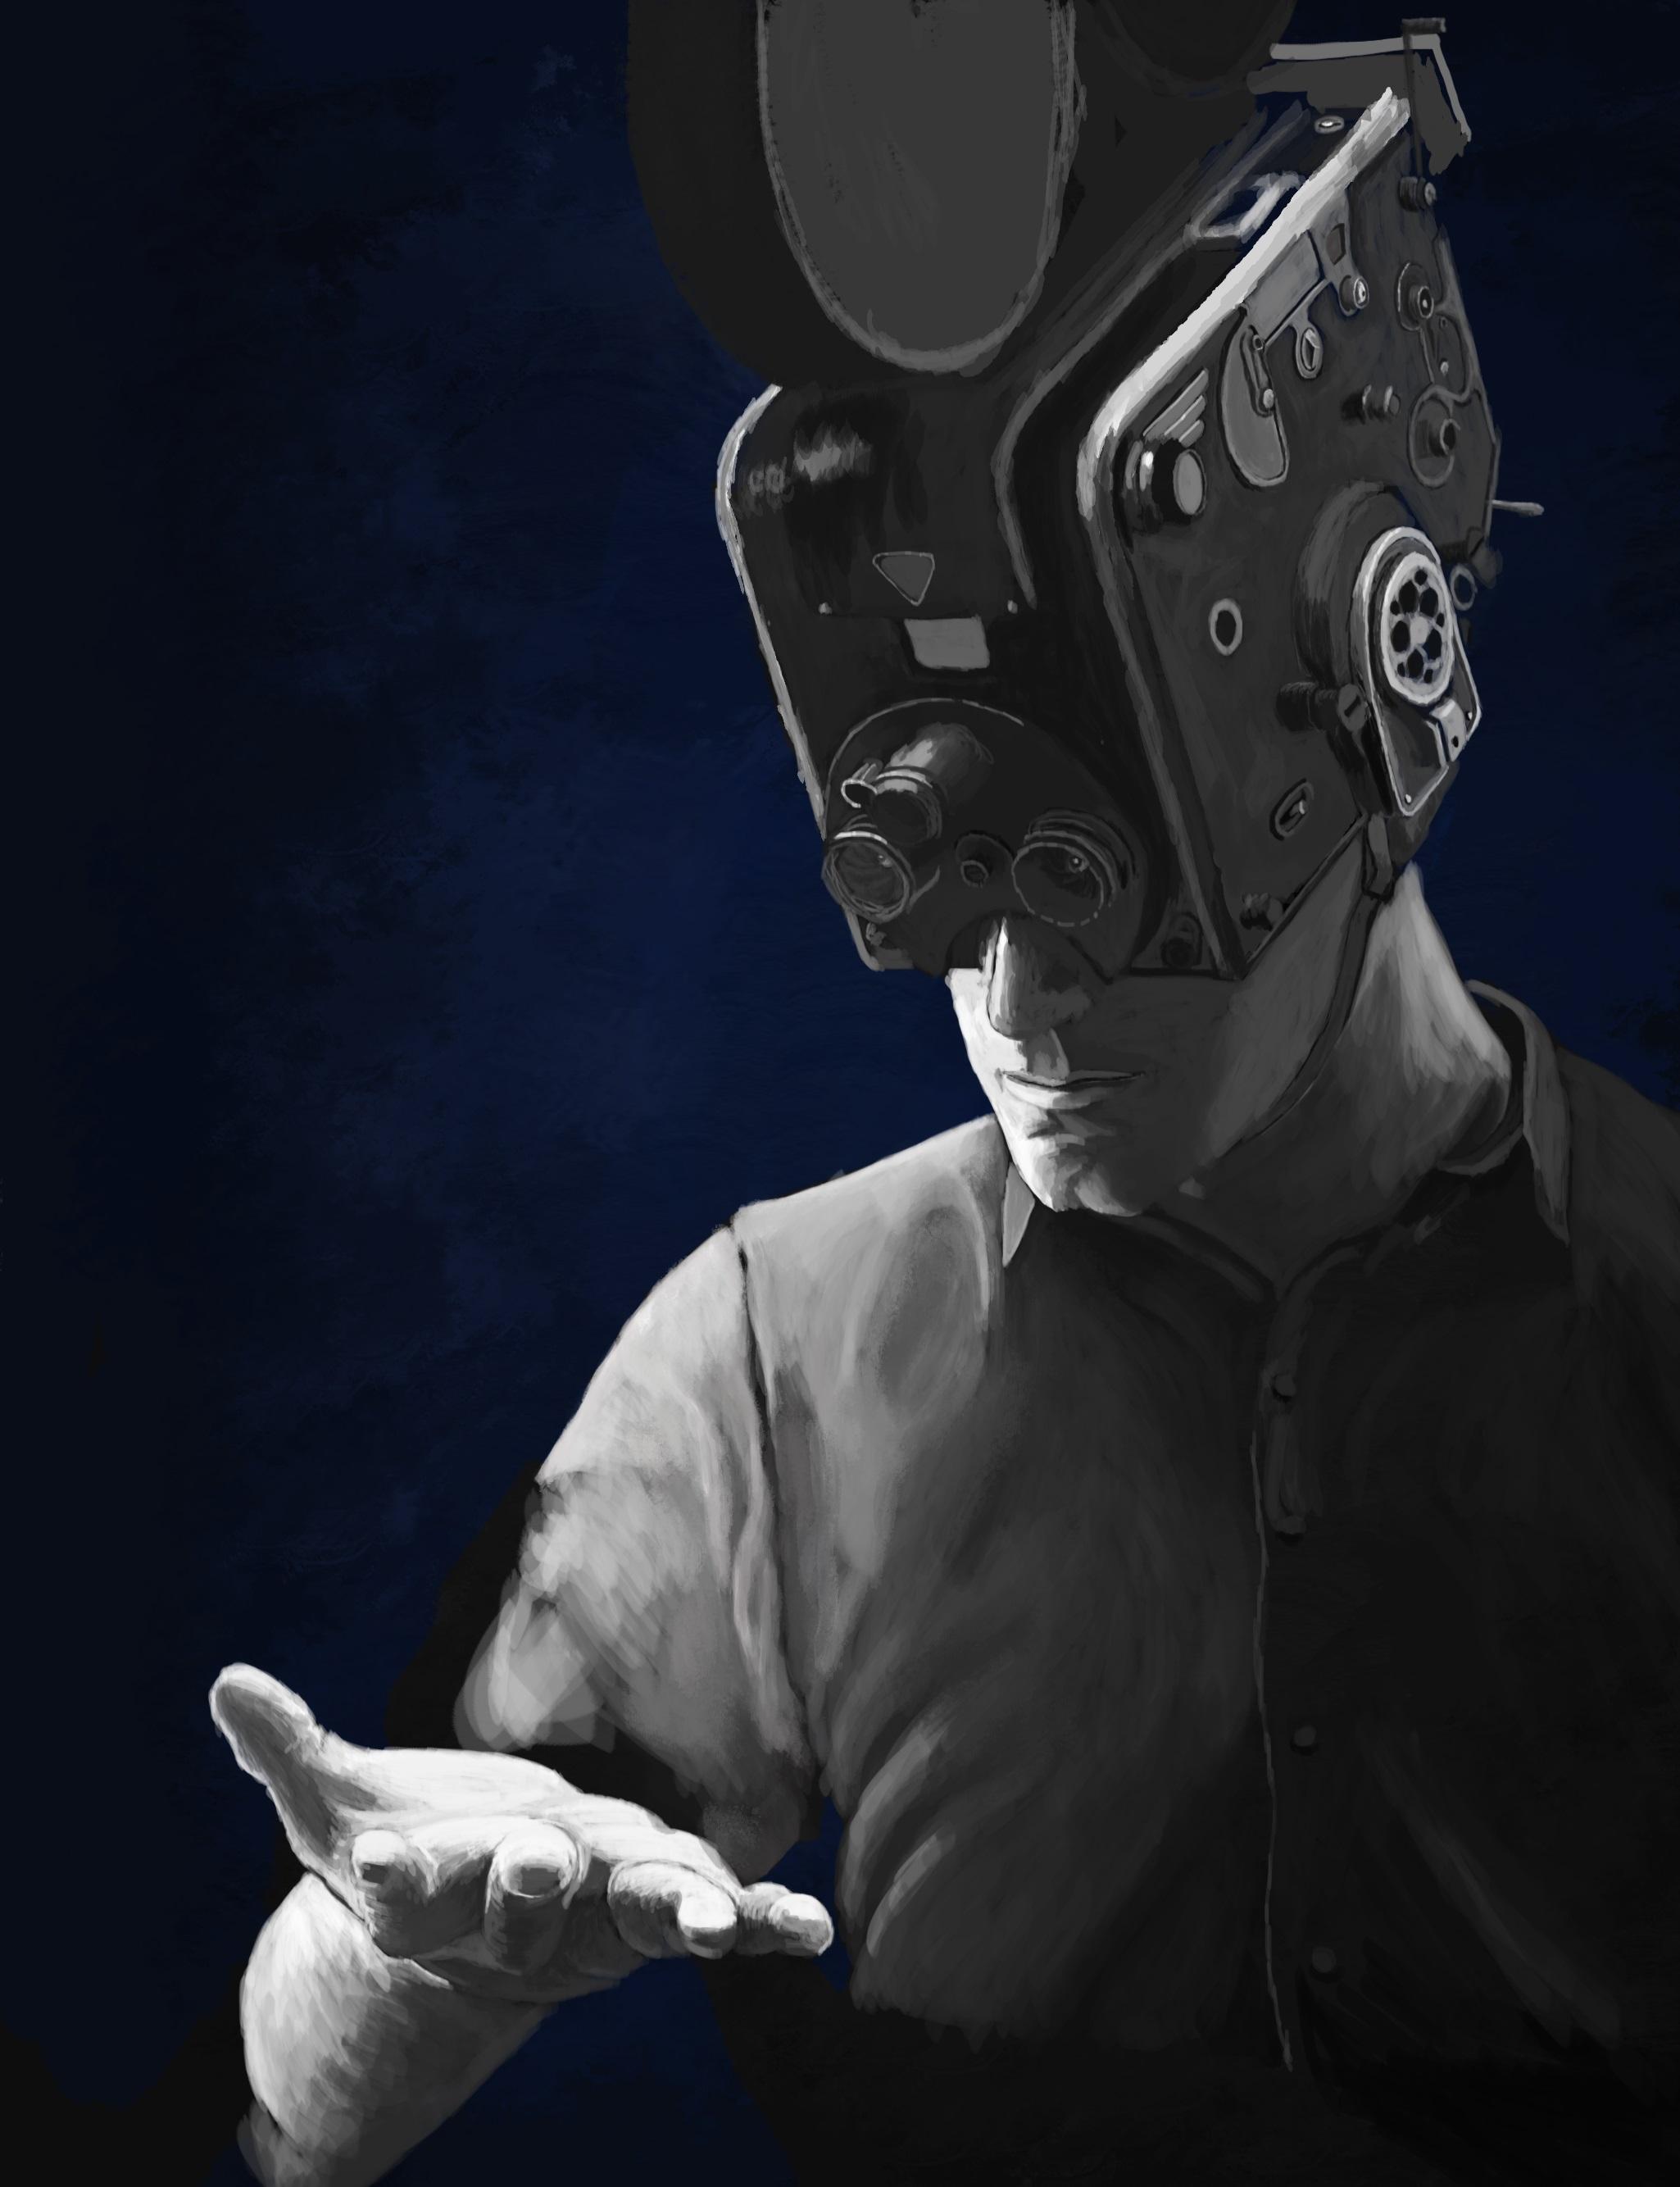 پوستر ششمین جشنواره ی النهج سینمایی